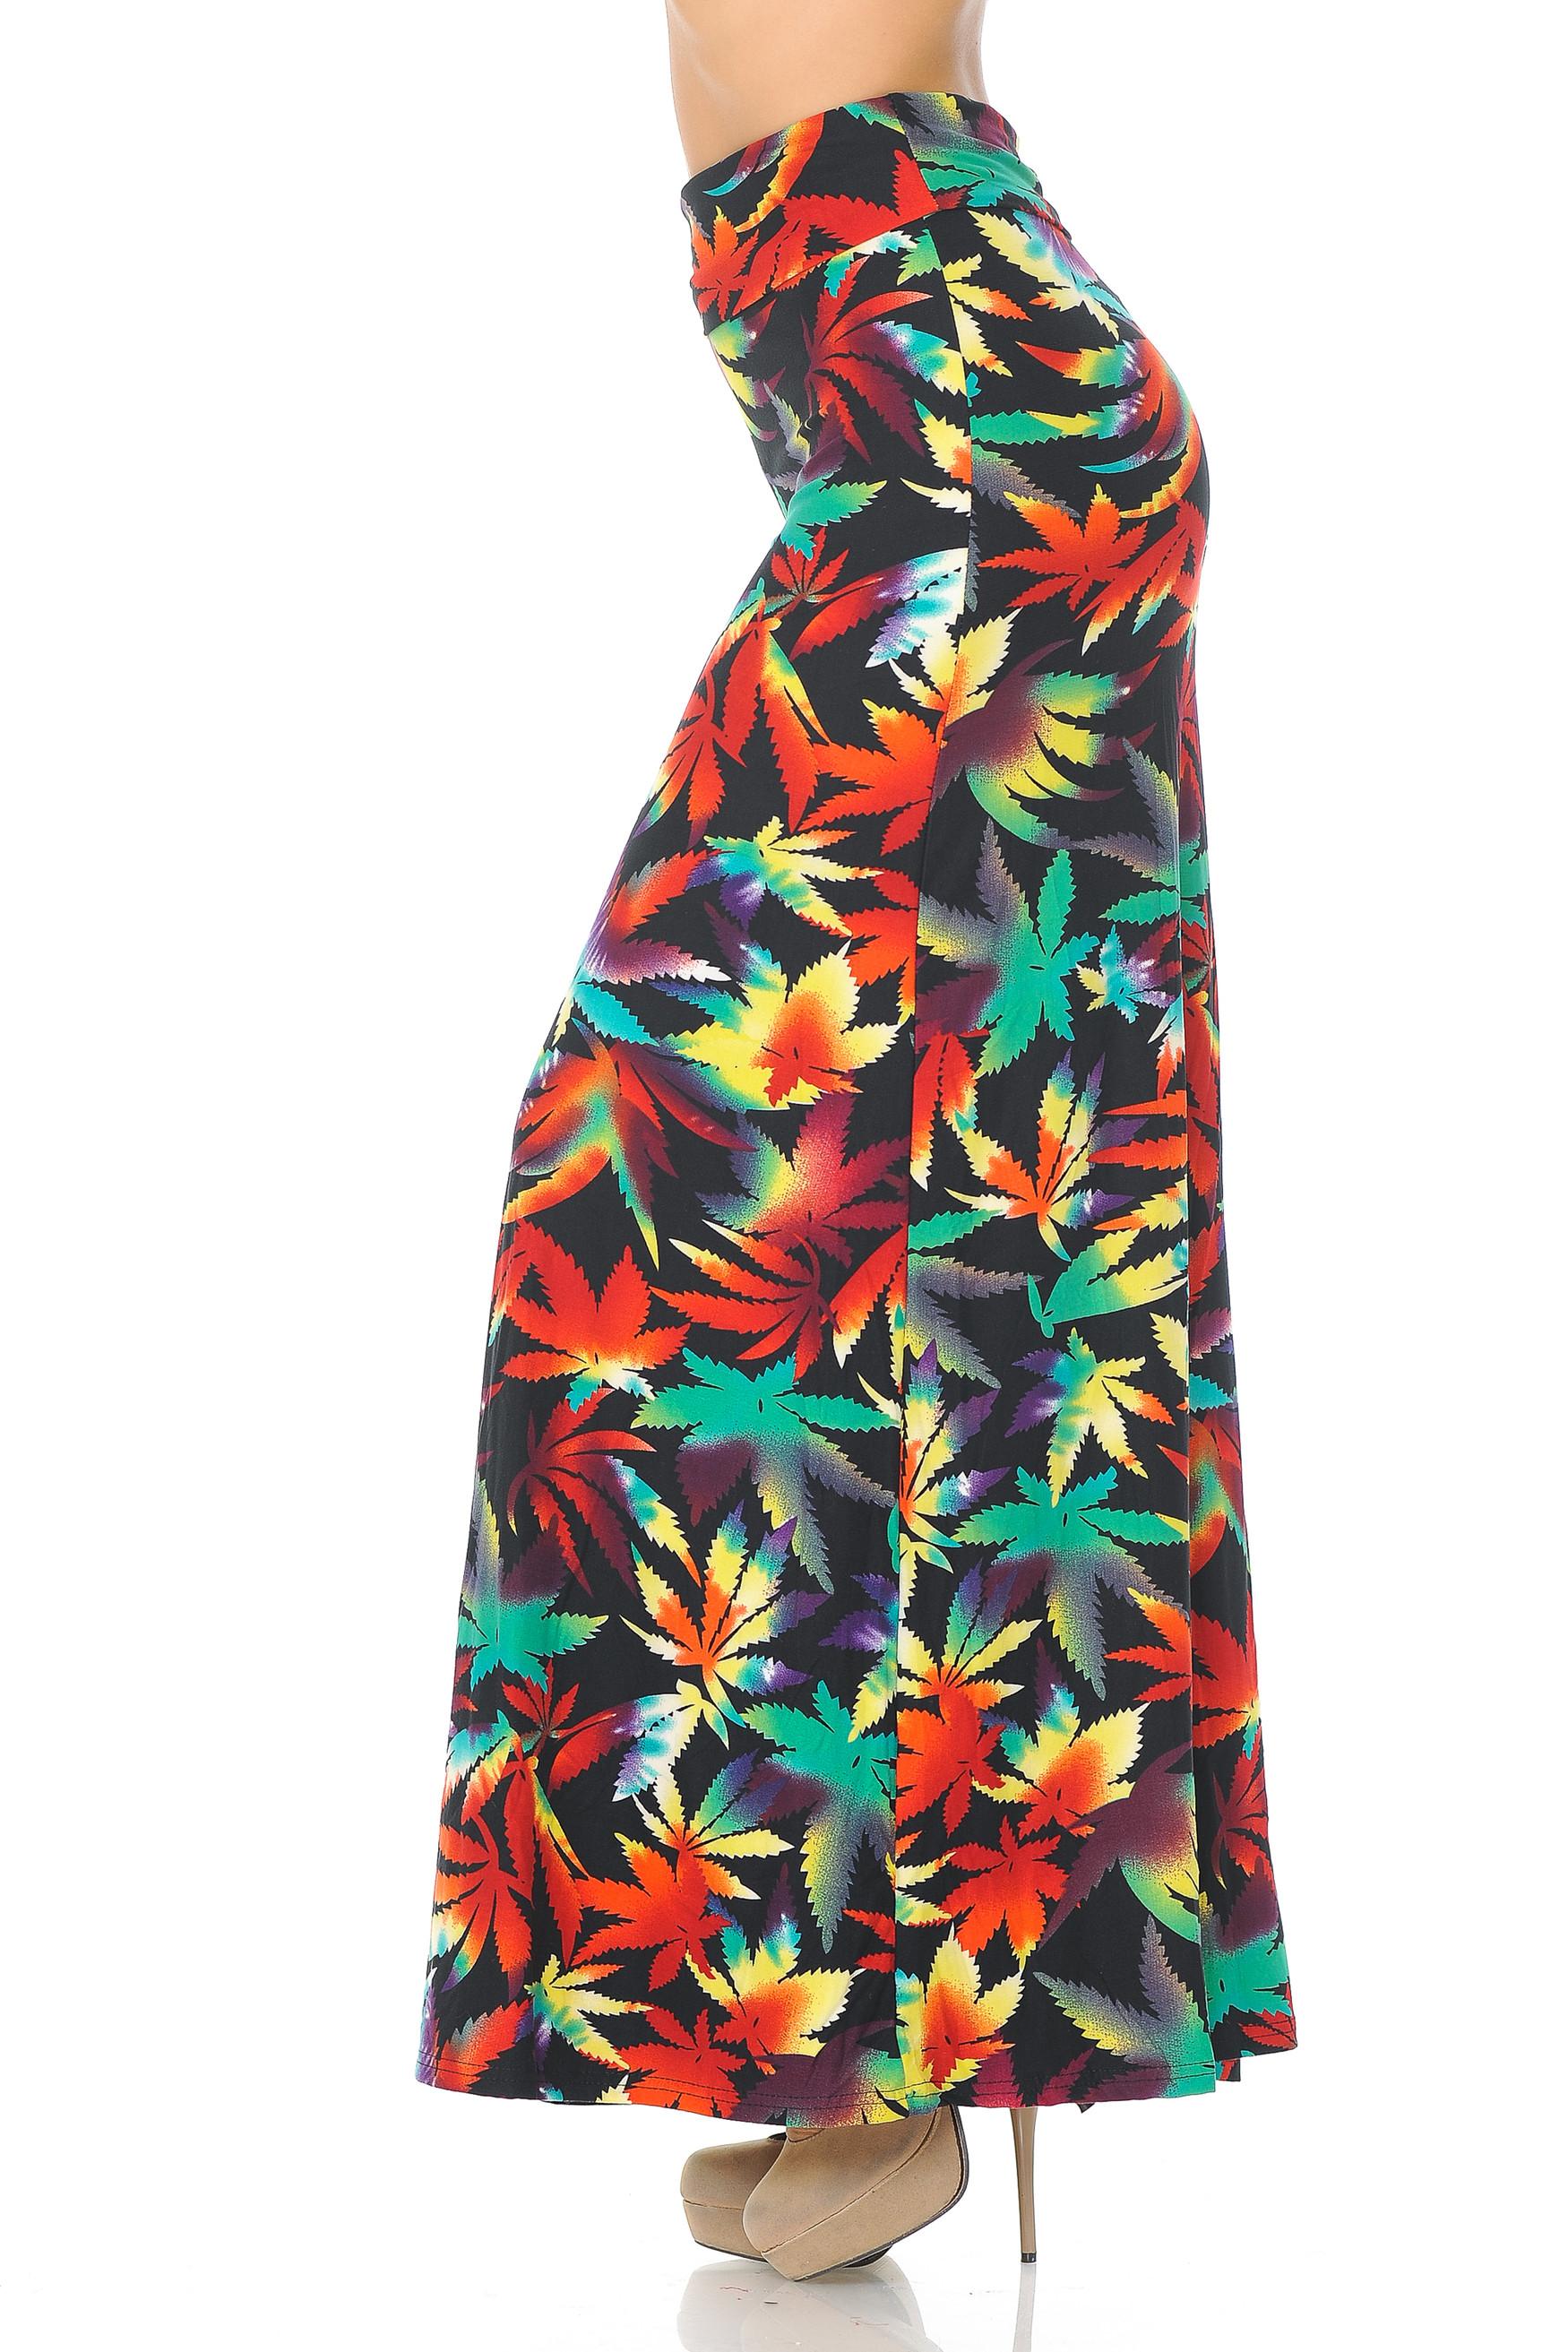 Brushed Rainbow Marijuana Maxi Skirt